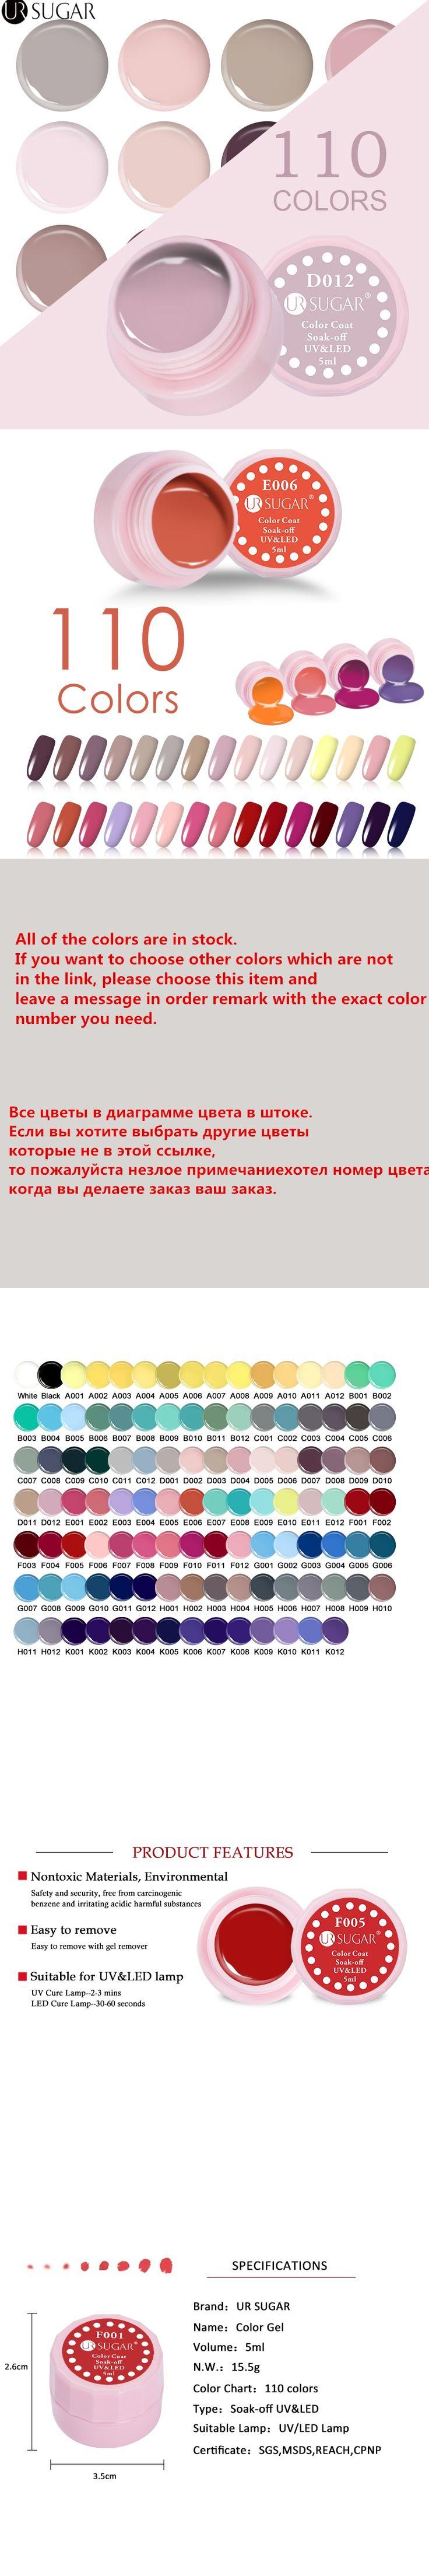 UR SUGAR Nude Color UV Gel Soak Off 110 Pure Colors Effect Coat UV LED Nail Gel Polish Nail Gel Varnish Nail Color Lacquer 5ml